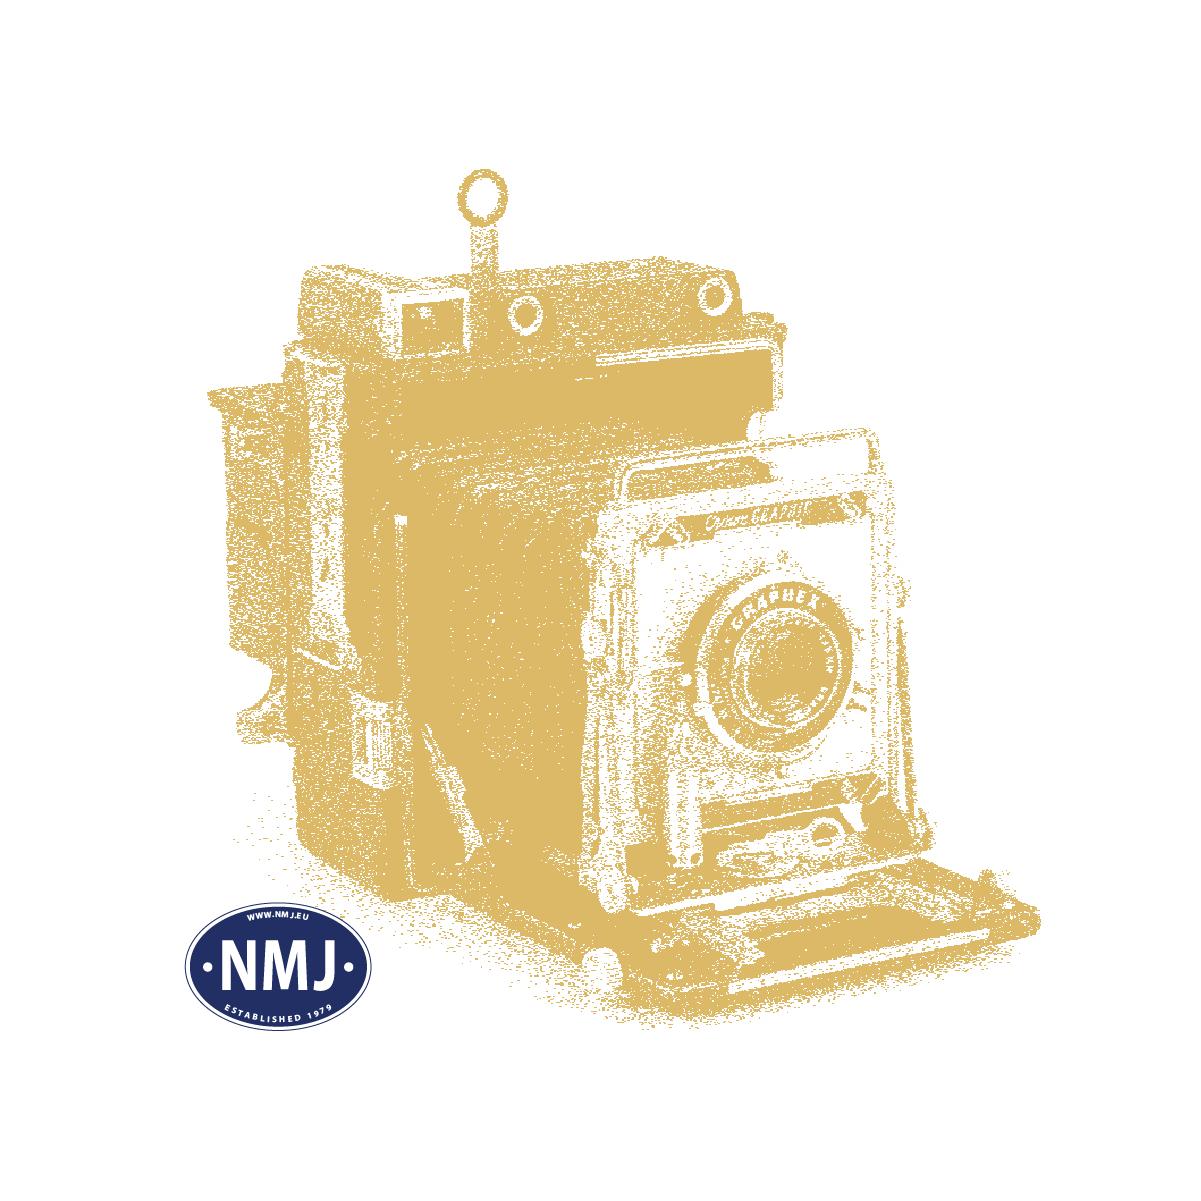 NMJT80.102 - NMJ Topline NSB EL17.2222 (V2.0), DC, rotbraun